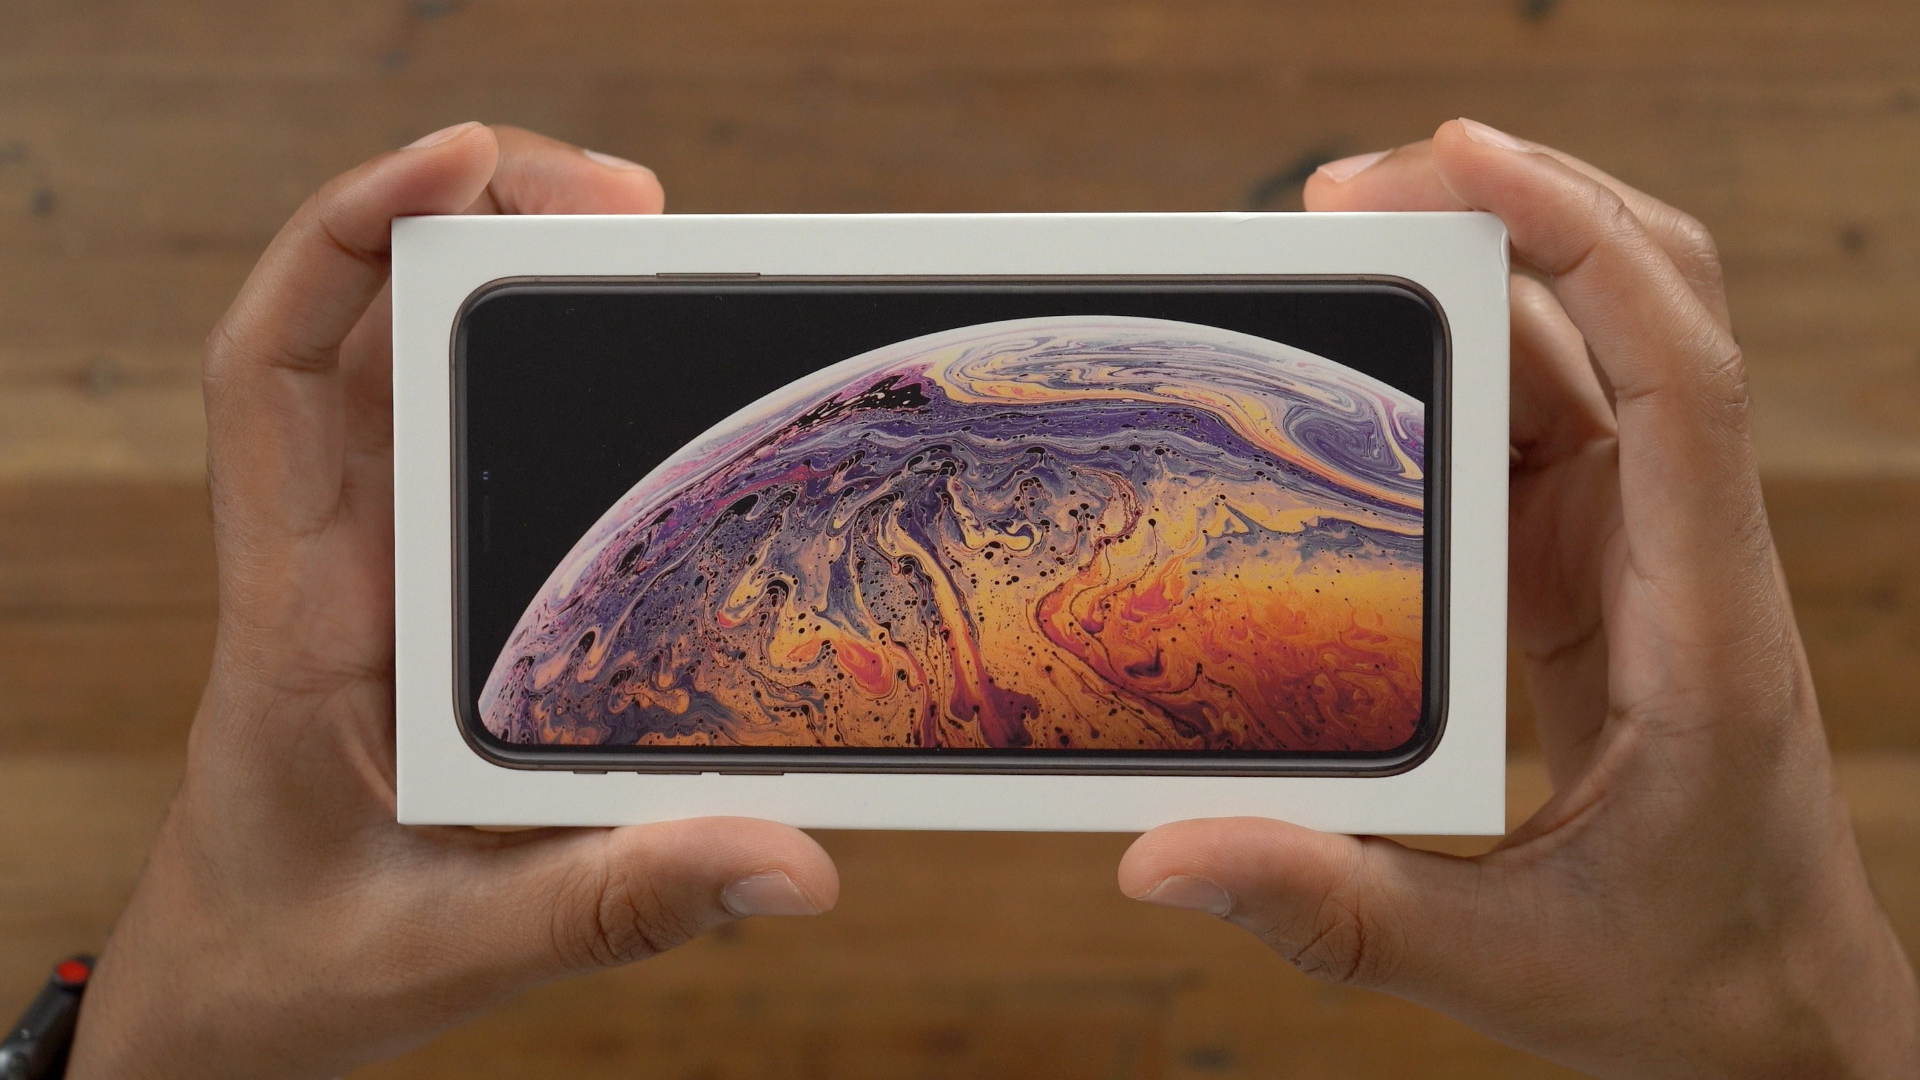 9to5mac.com - Jeff Benjamin - Top 20+ iPhone XS and iPhone XS Max features [Video]